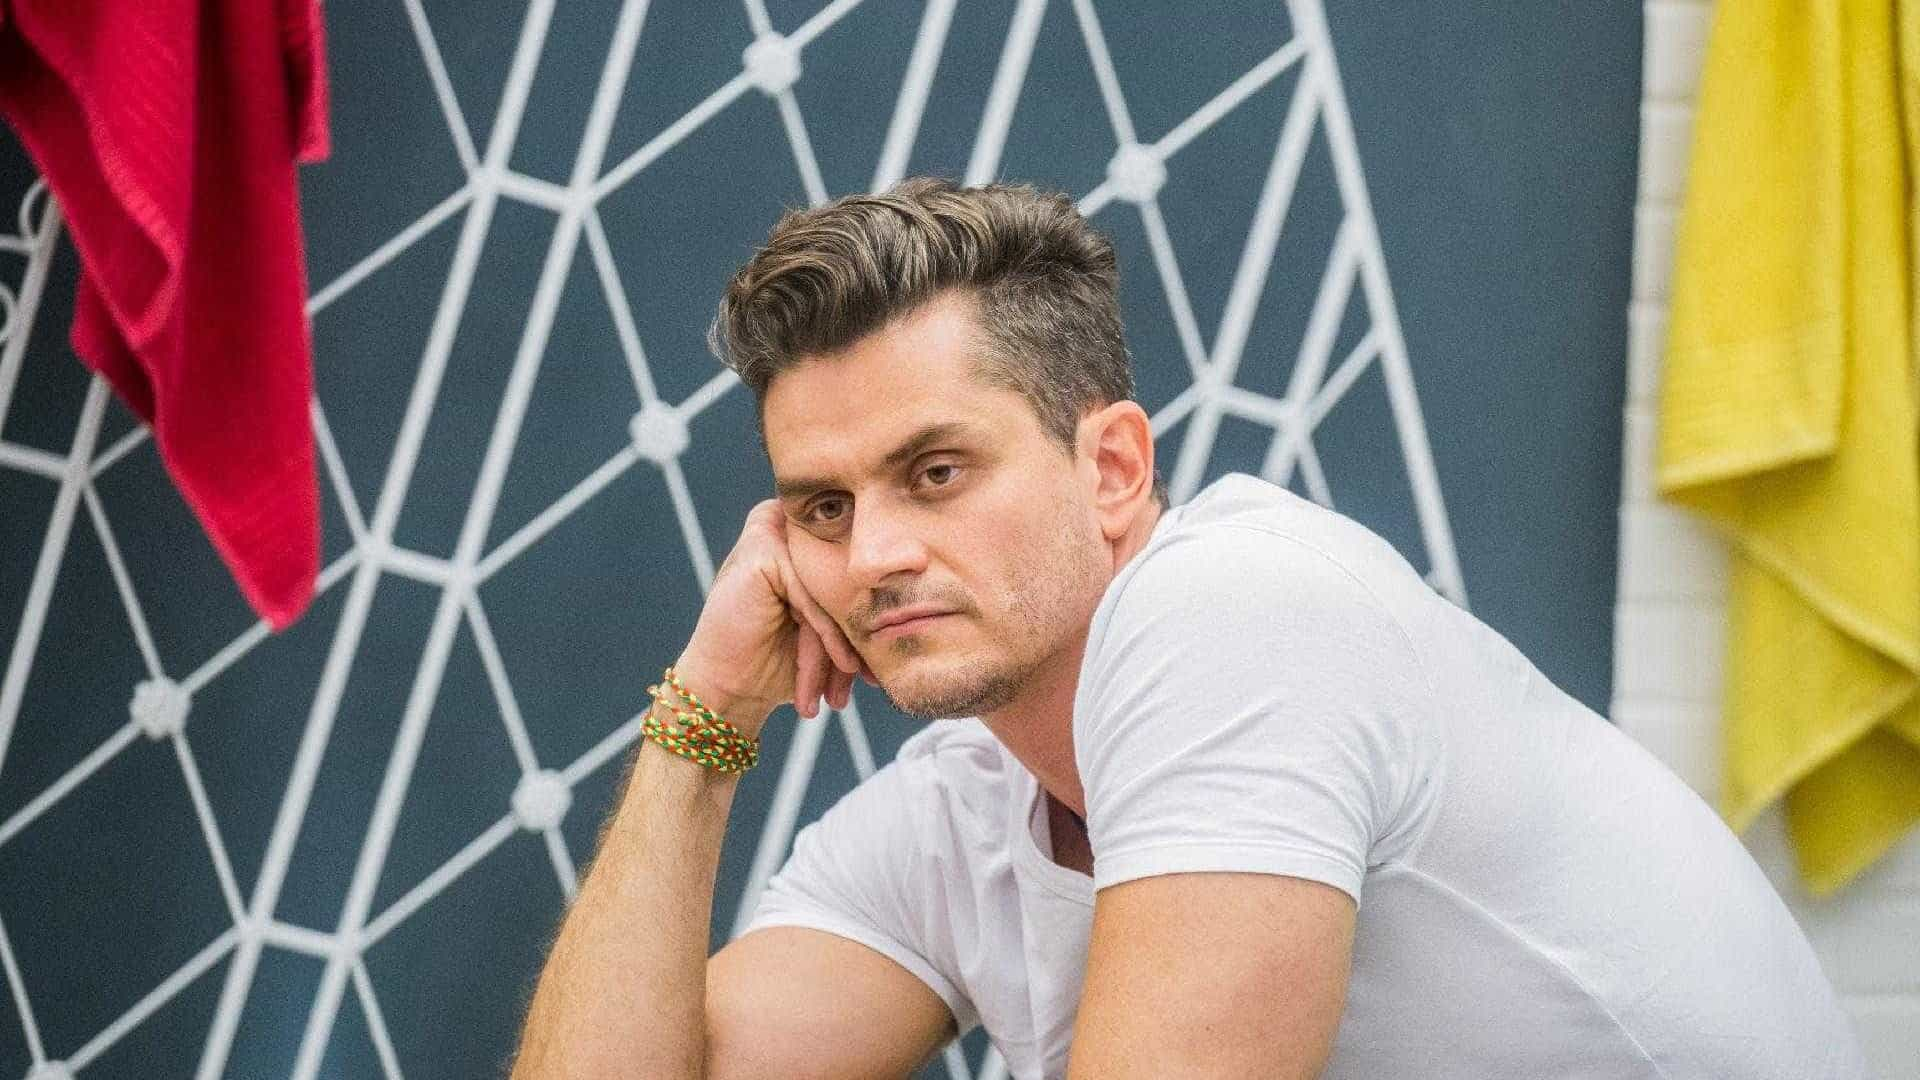 Marcos Harter culpa álcool por suposta agressão a Emilly no 'BBB17'